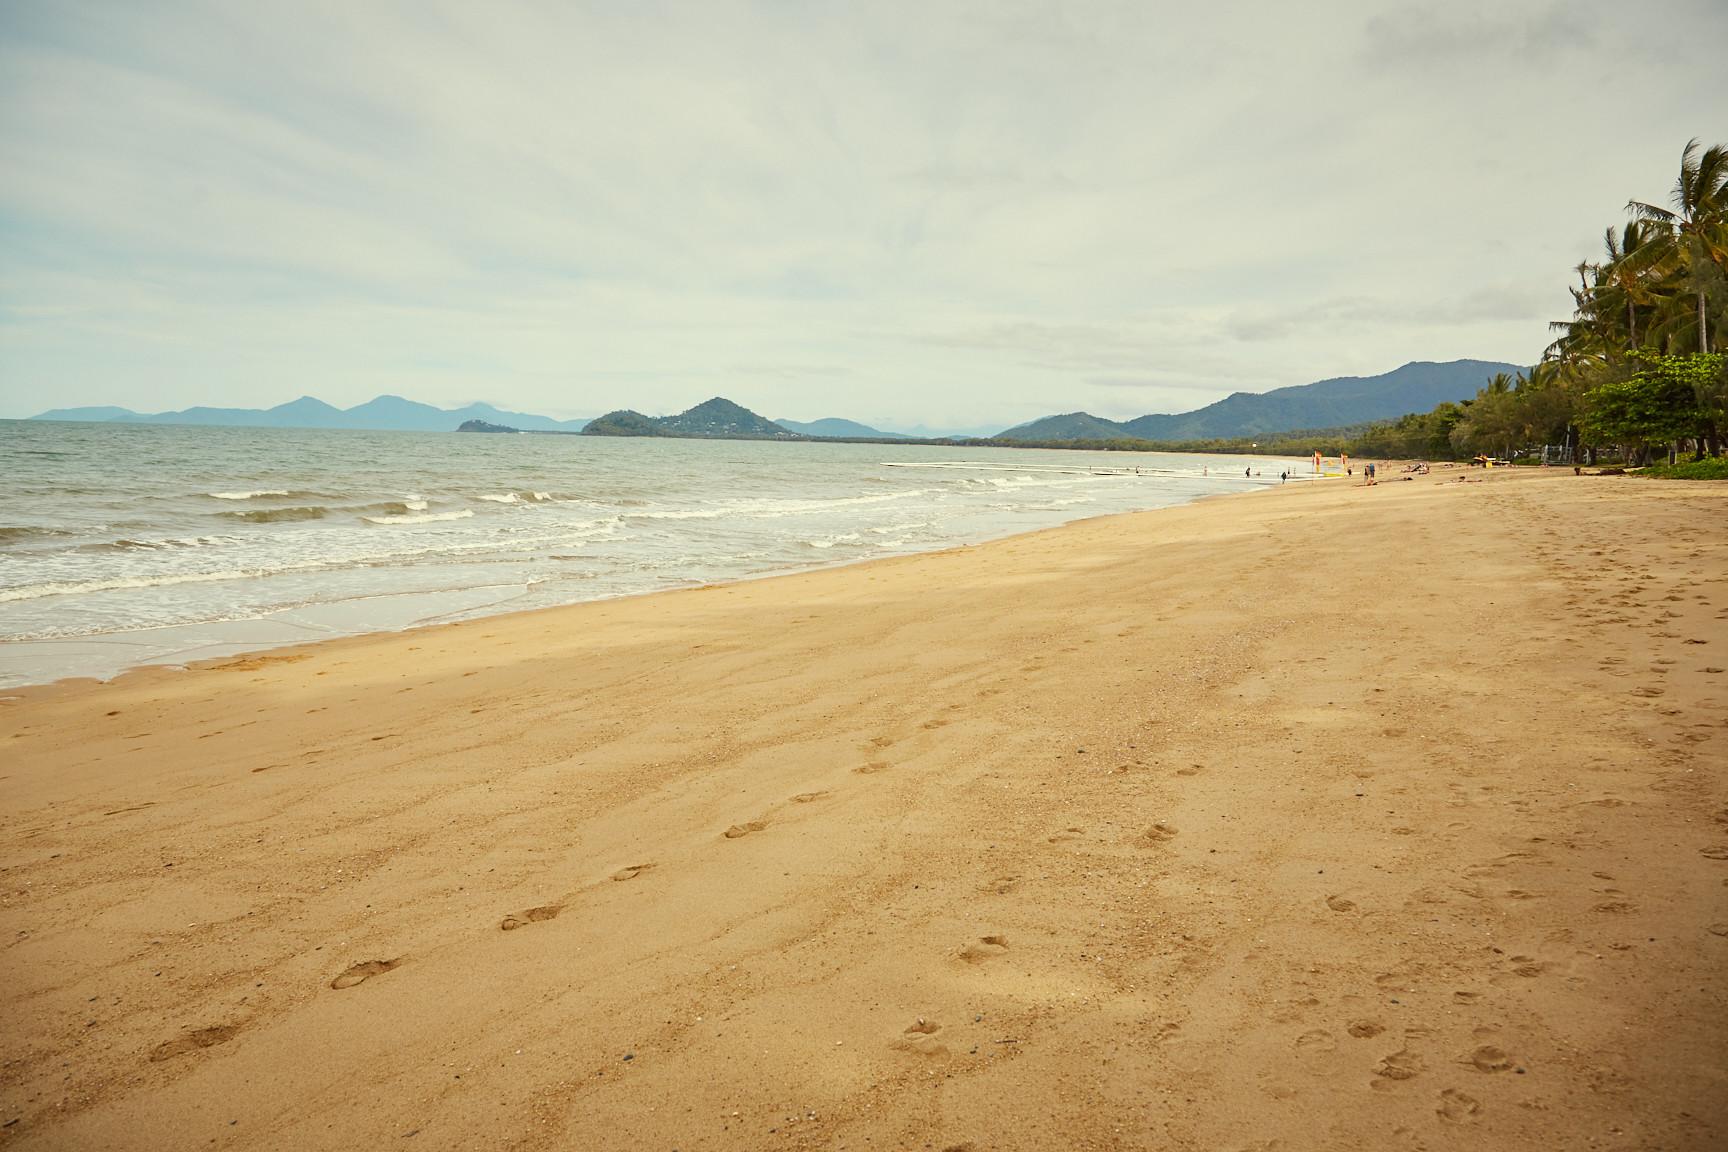 Quallen in Australien, Strand, Cairns, Quallensaison, Roadtrip, Australien, Miles and Shores